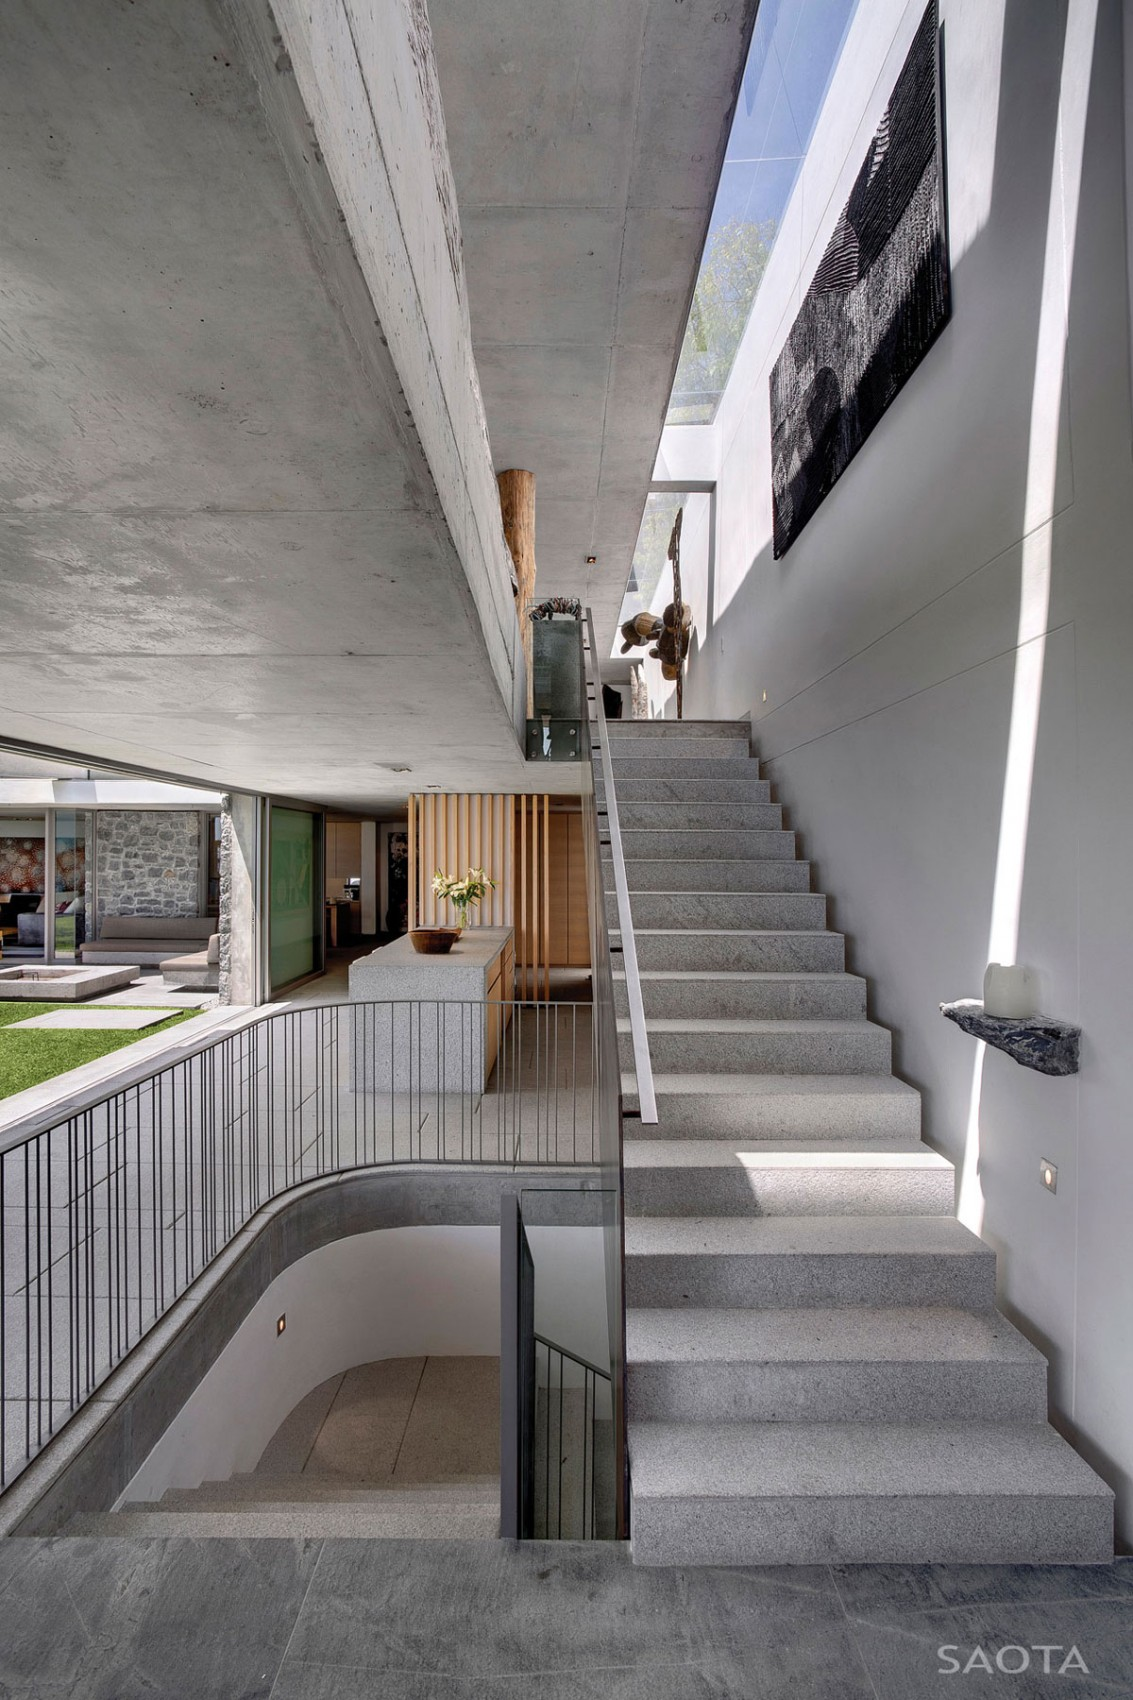 Modern House Designs De Wet 34 By SAOTA Architecture Beast